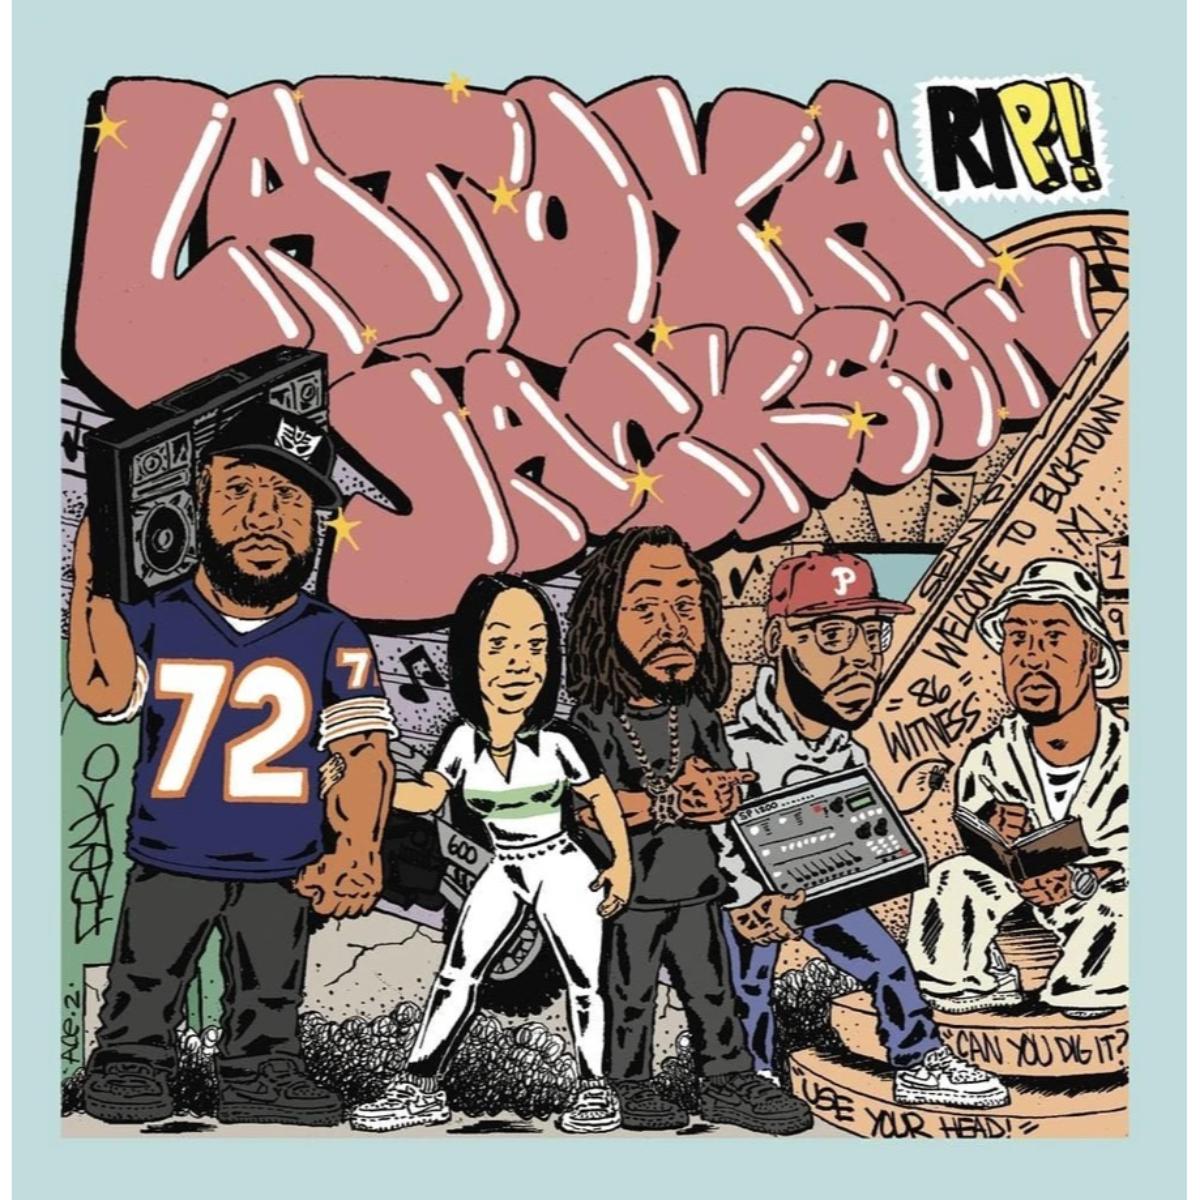 "Sean Price & Small Professor - Latoya Jackson b/w Back to the Old School Remix feat. Masta Ace (7"" vinyl)"